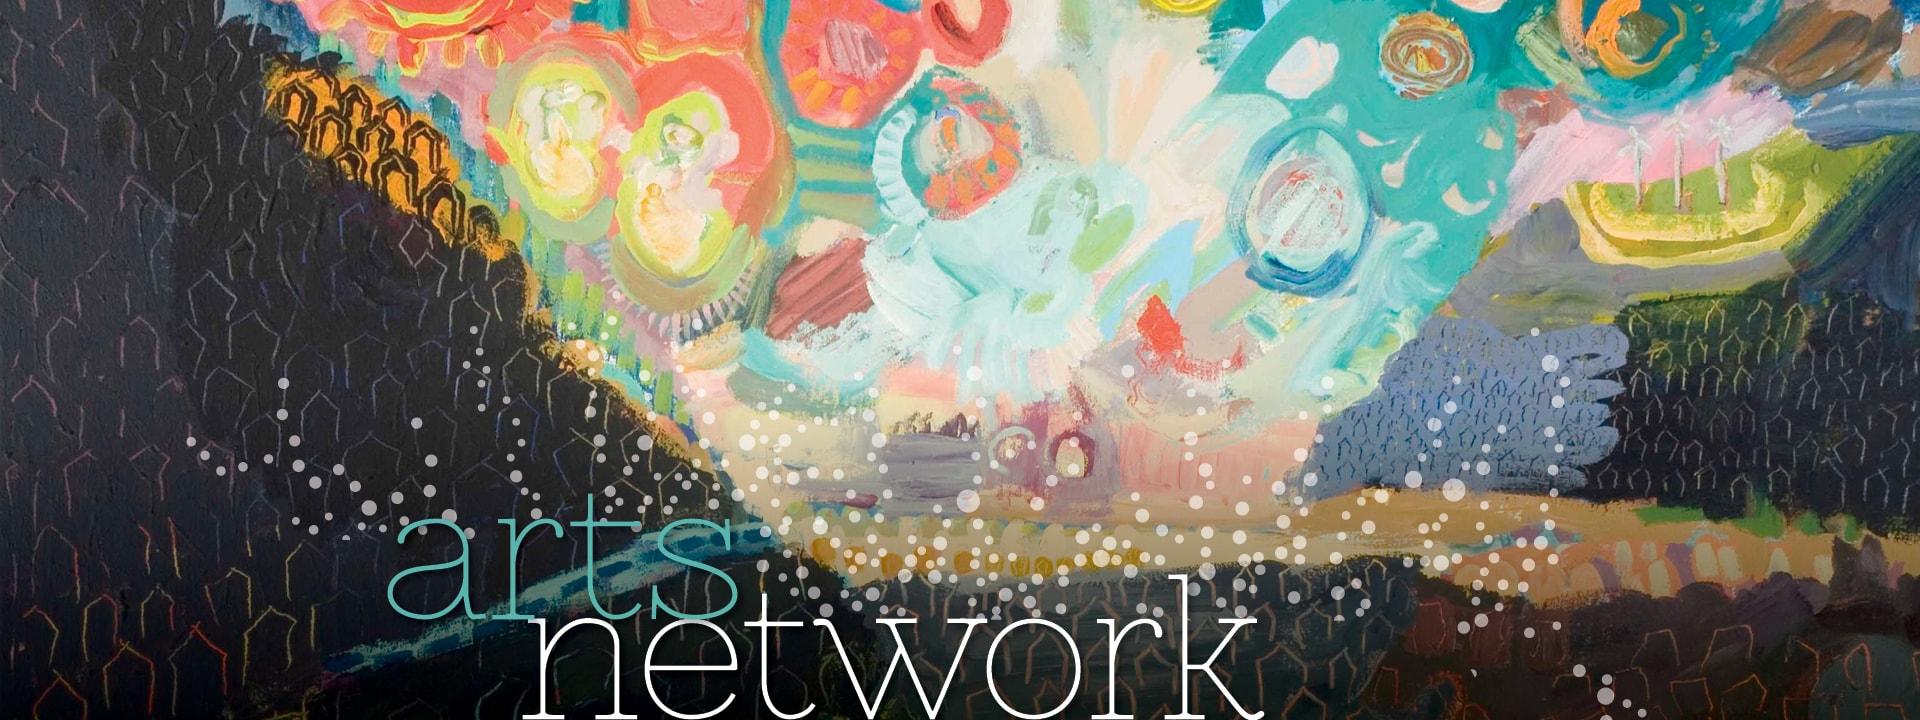 LexArts Network